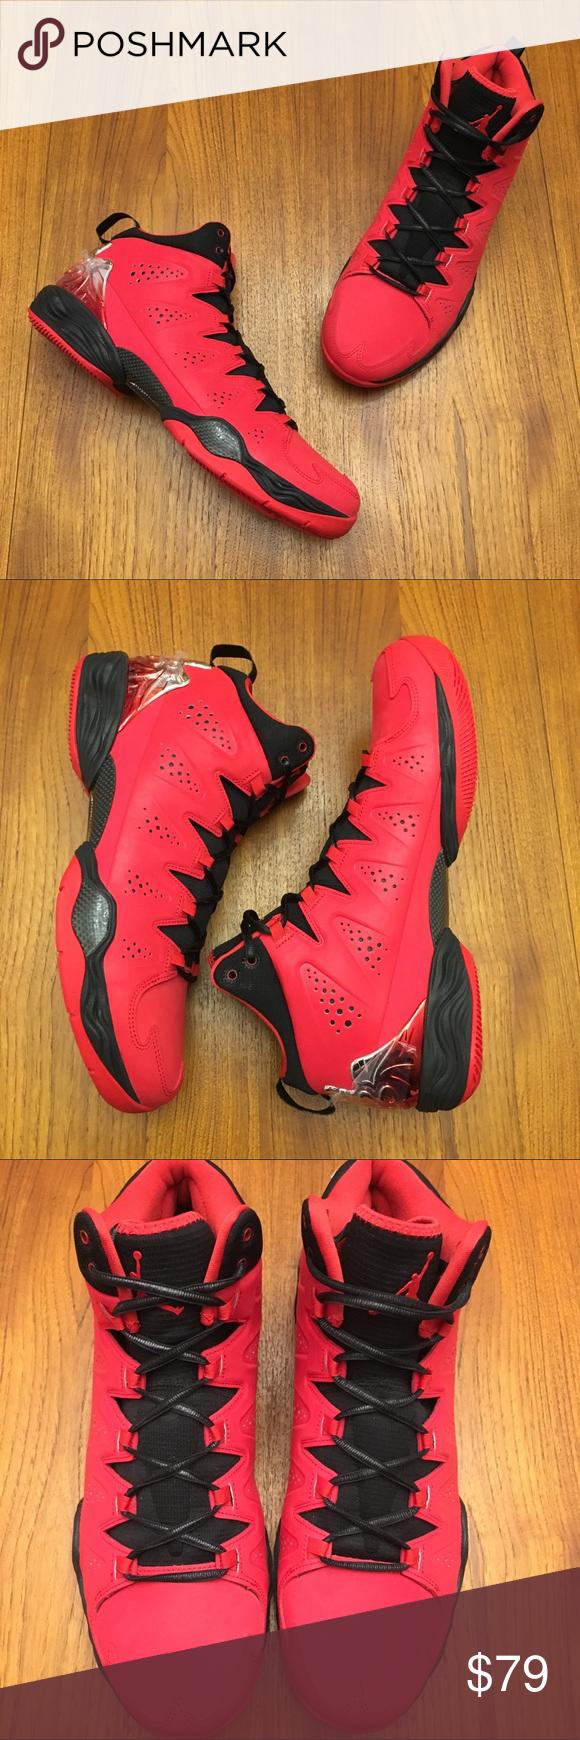 "6b107244865405 Jordan Melo M10 Fire Red New Size 12.5 Nike Air Jordan Melo M10 ""Fire Red"